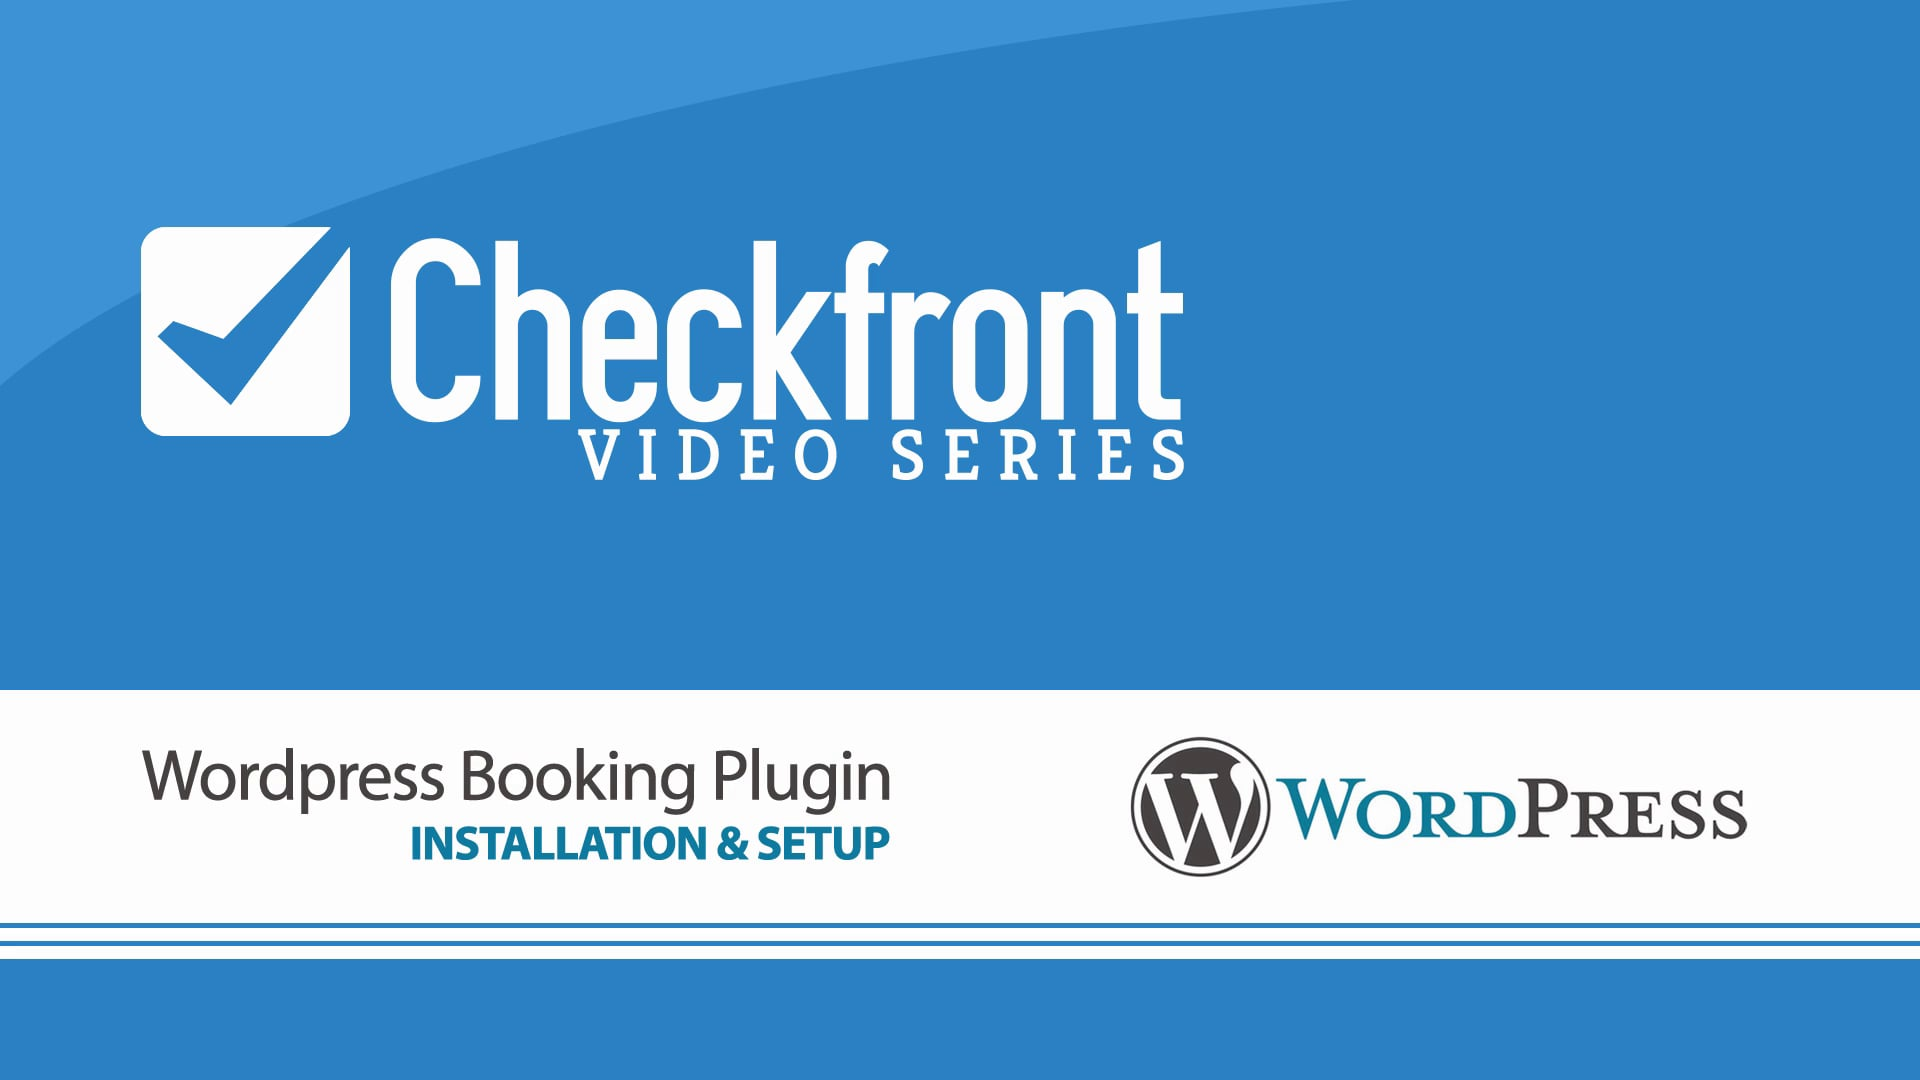 WordPress Booking Plugin for Checkfront